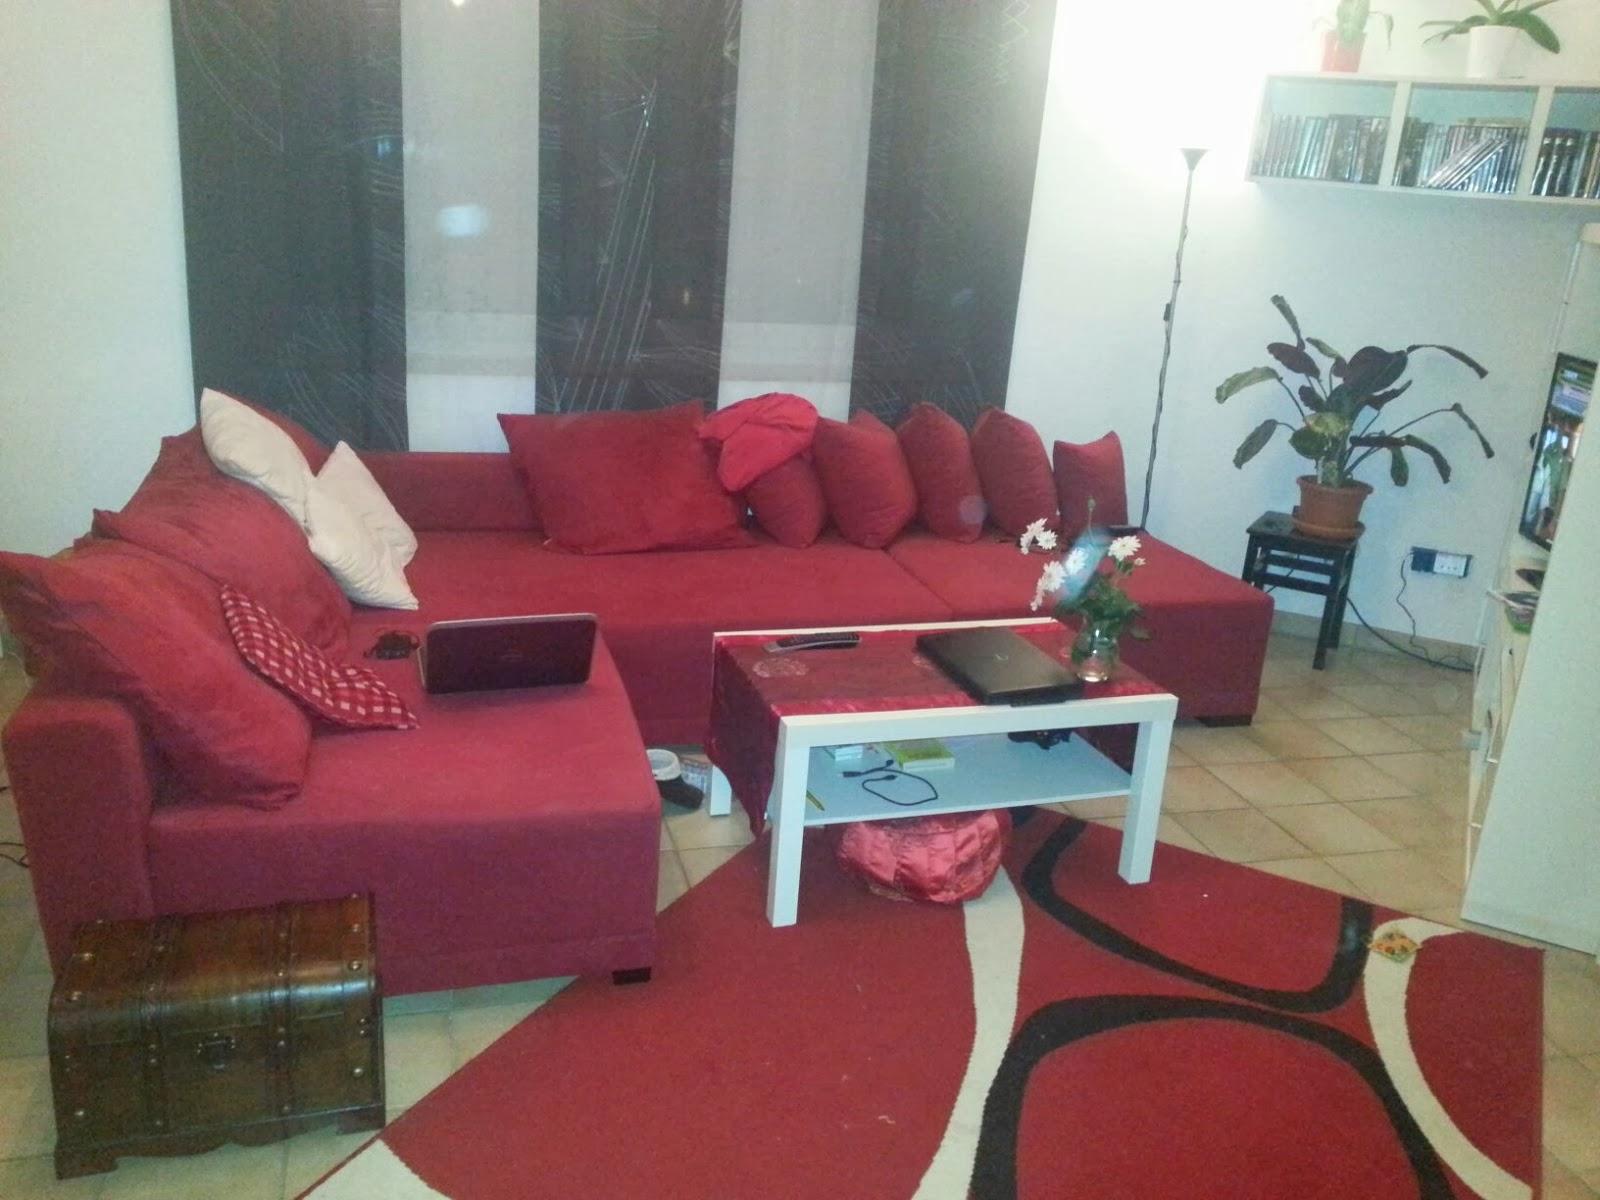 manuela sonntag im diagonalen raum oder ikea f r fortgeschrittene. Black Bedroom Furniture Sets. Home Design Ideas